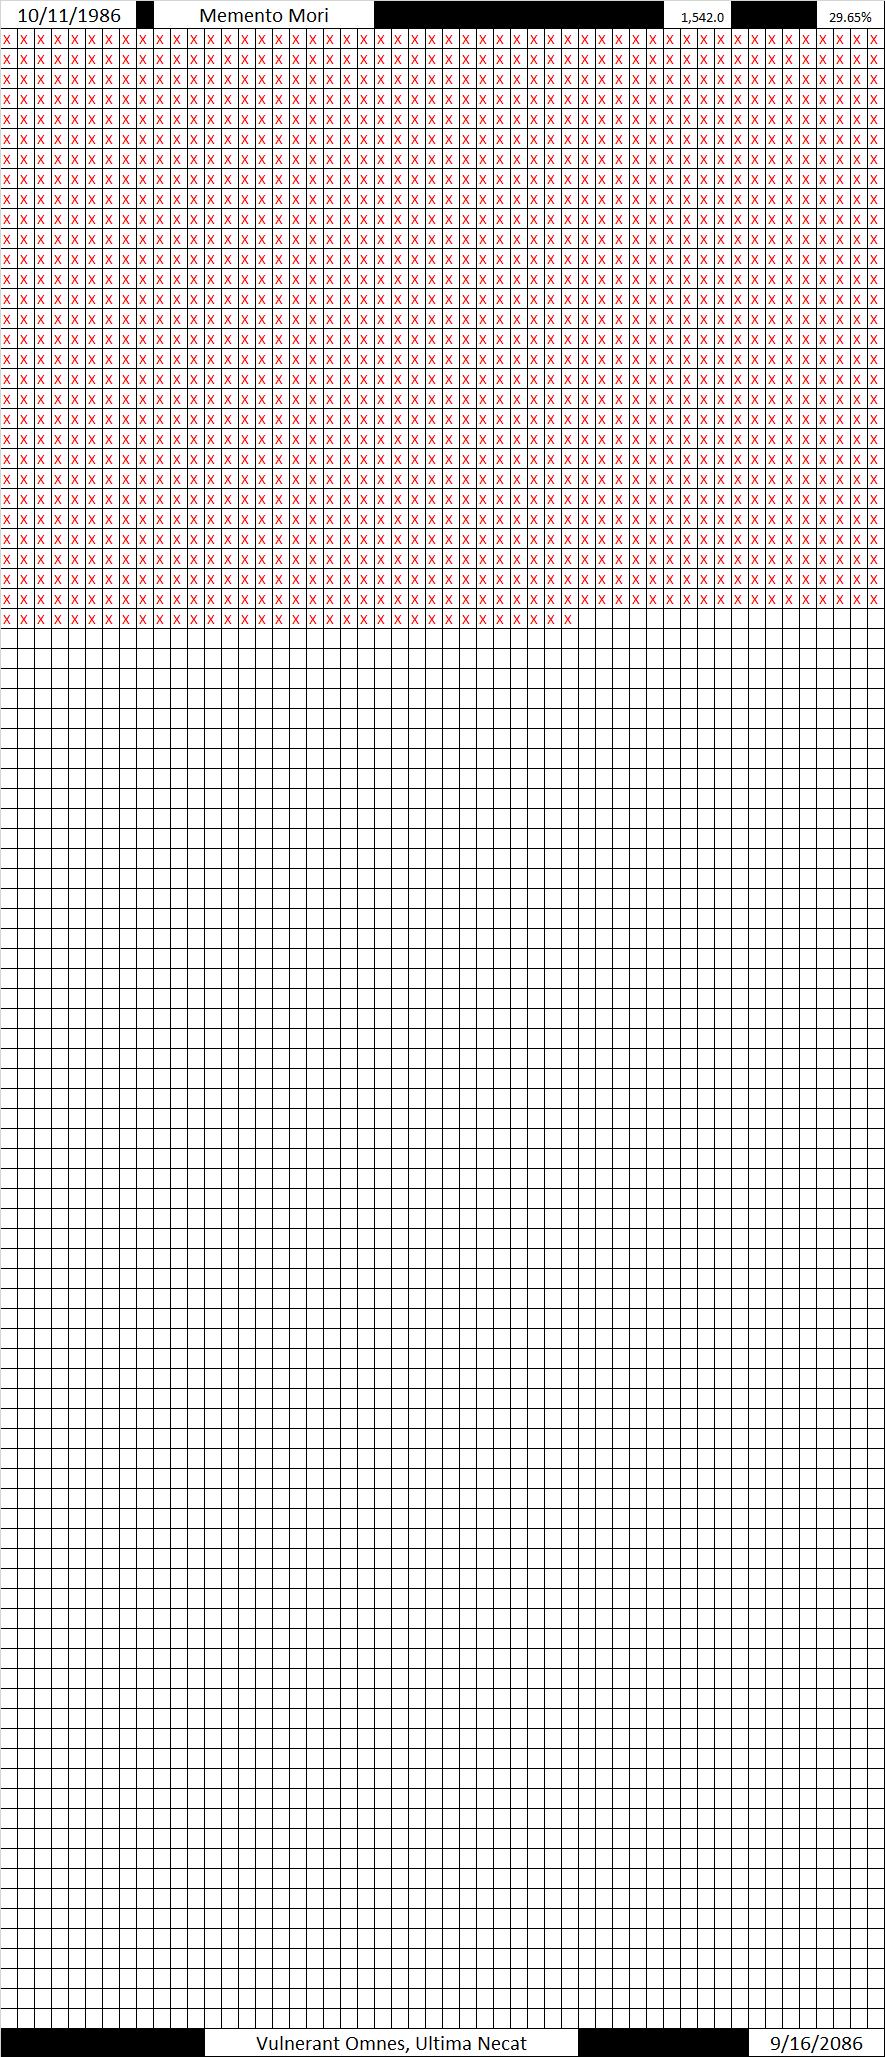 Momento Mori Full Chart